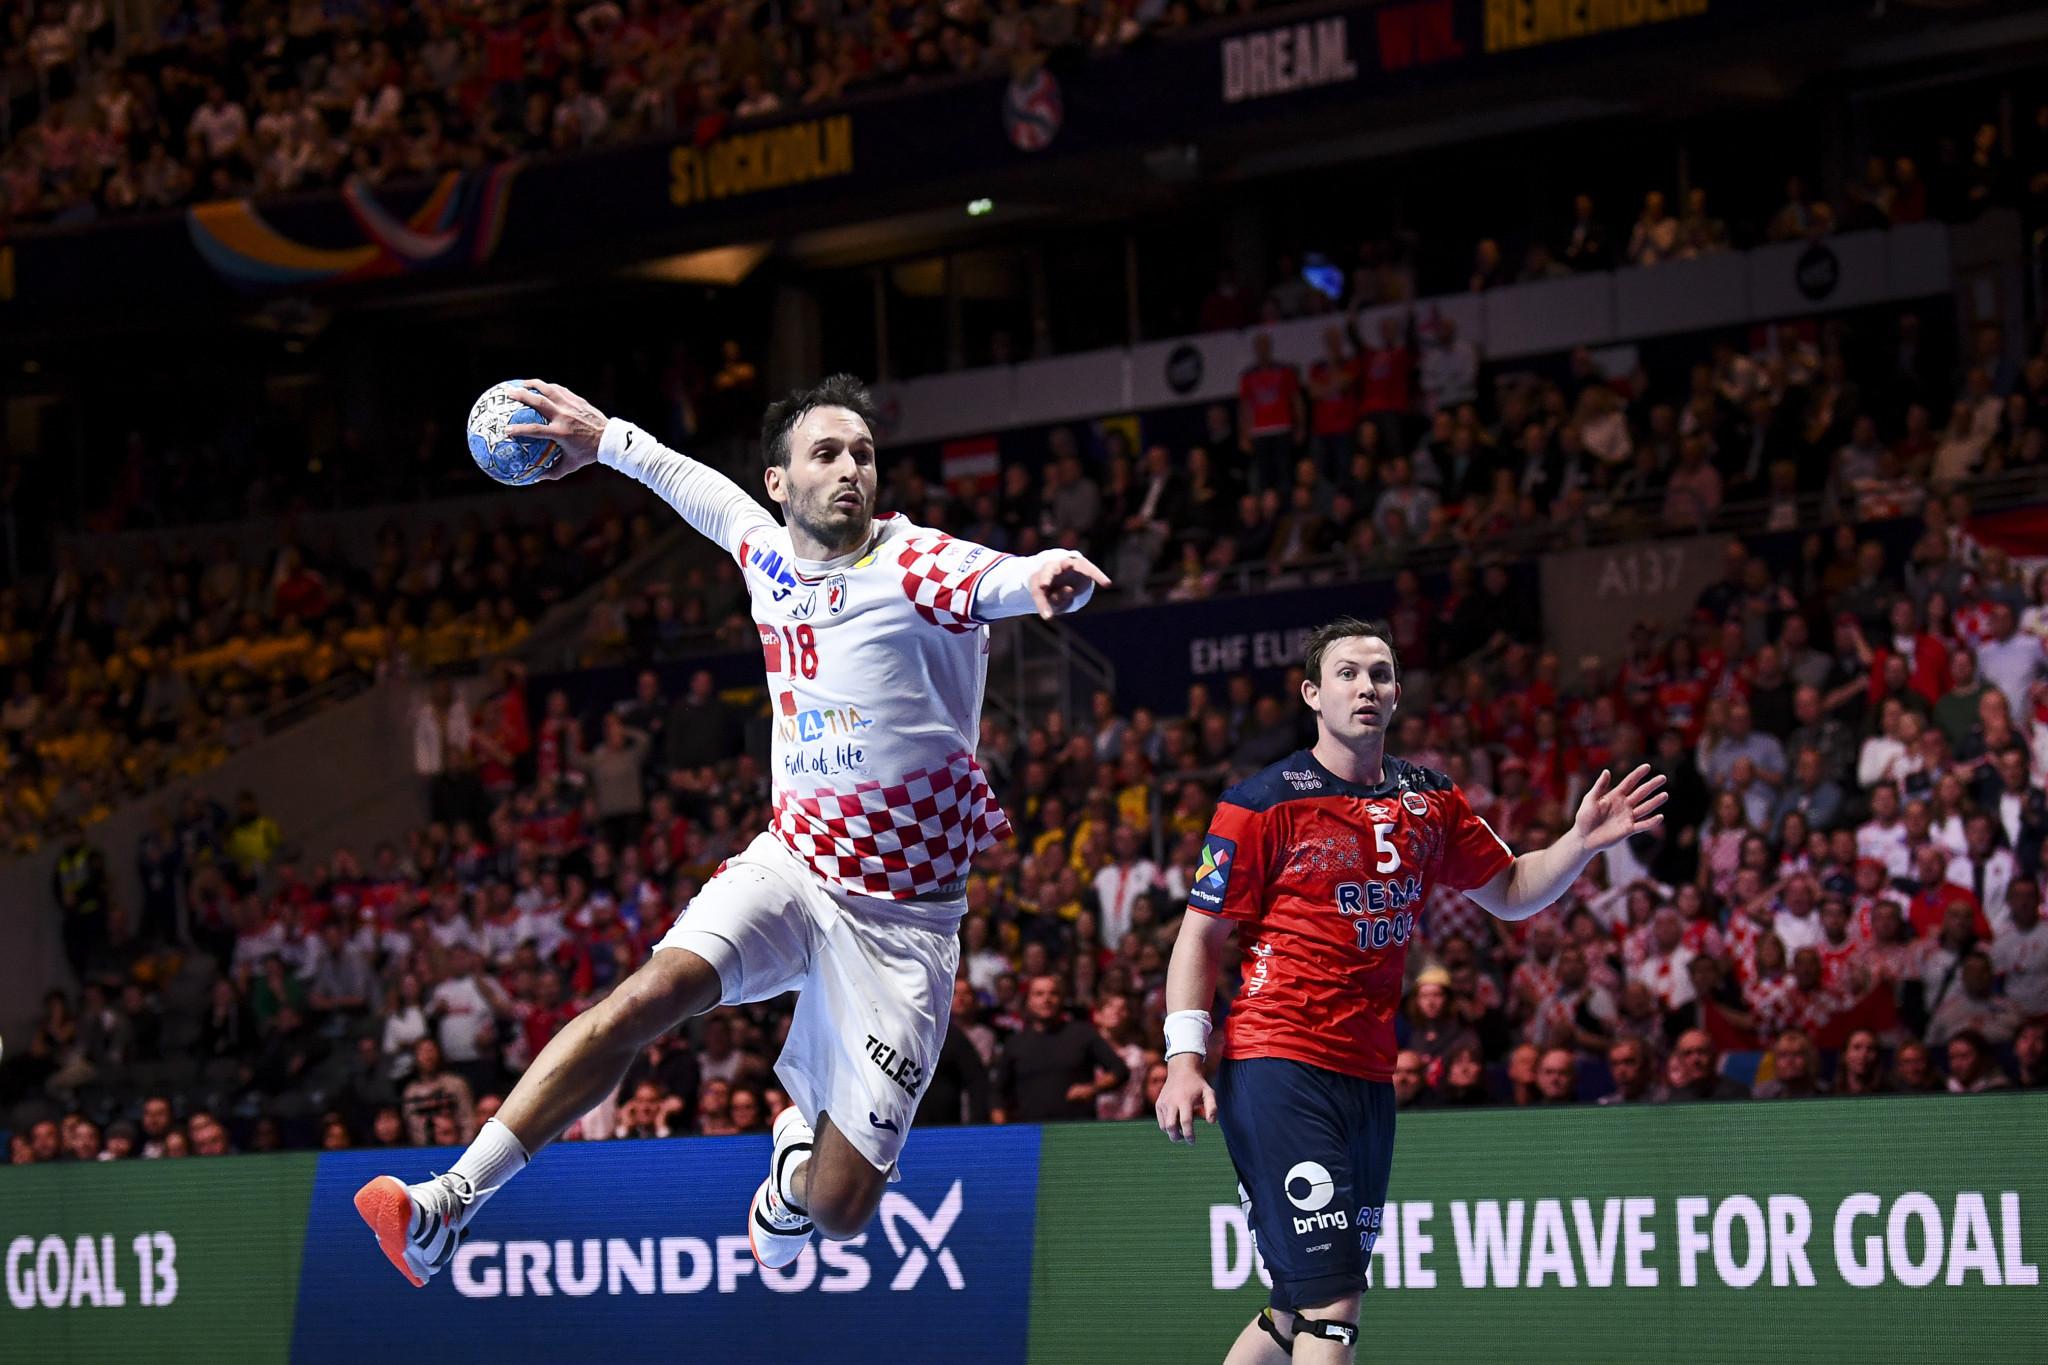 Croatia, Denmark and Norway will co-host the 2025 Men's Handball World Championship ©Getty Images